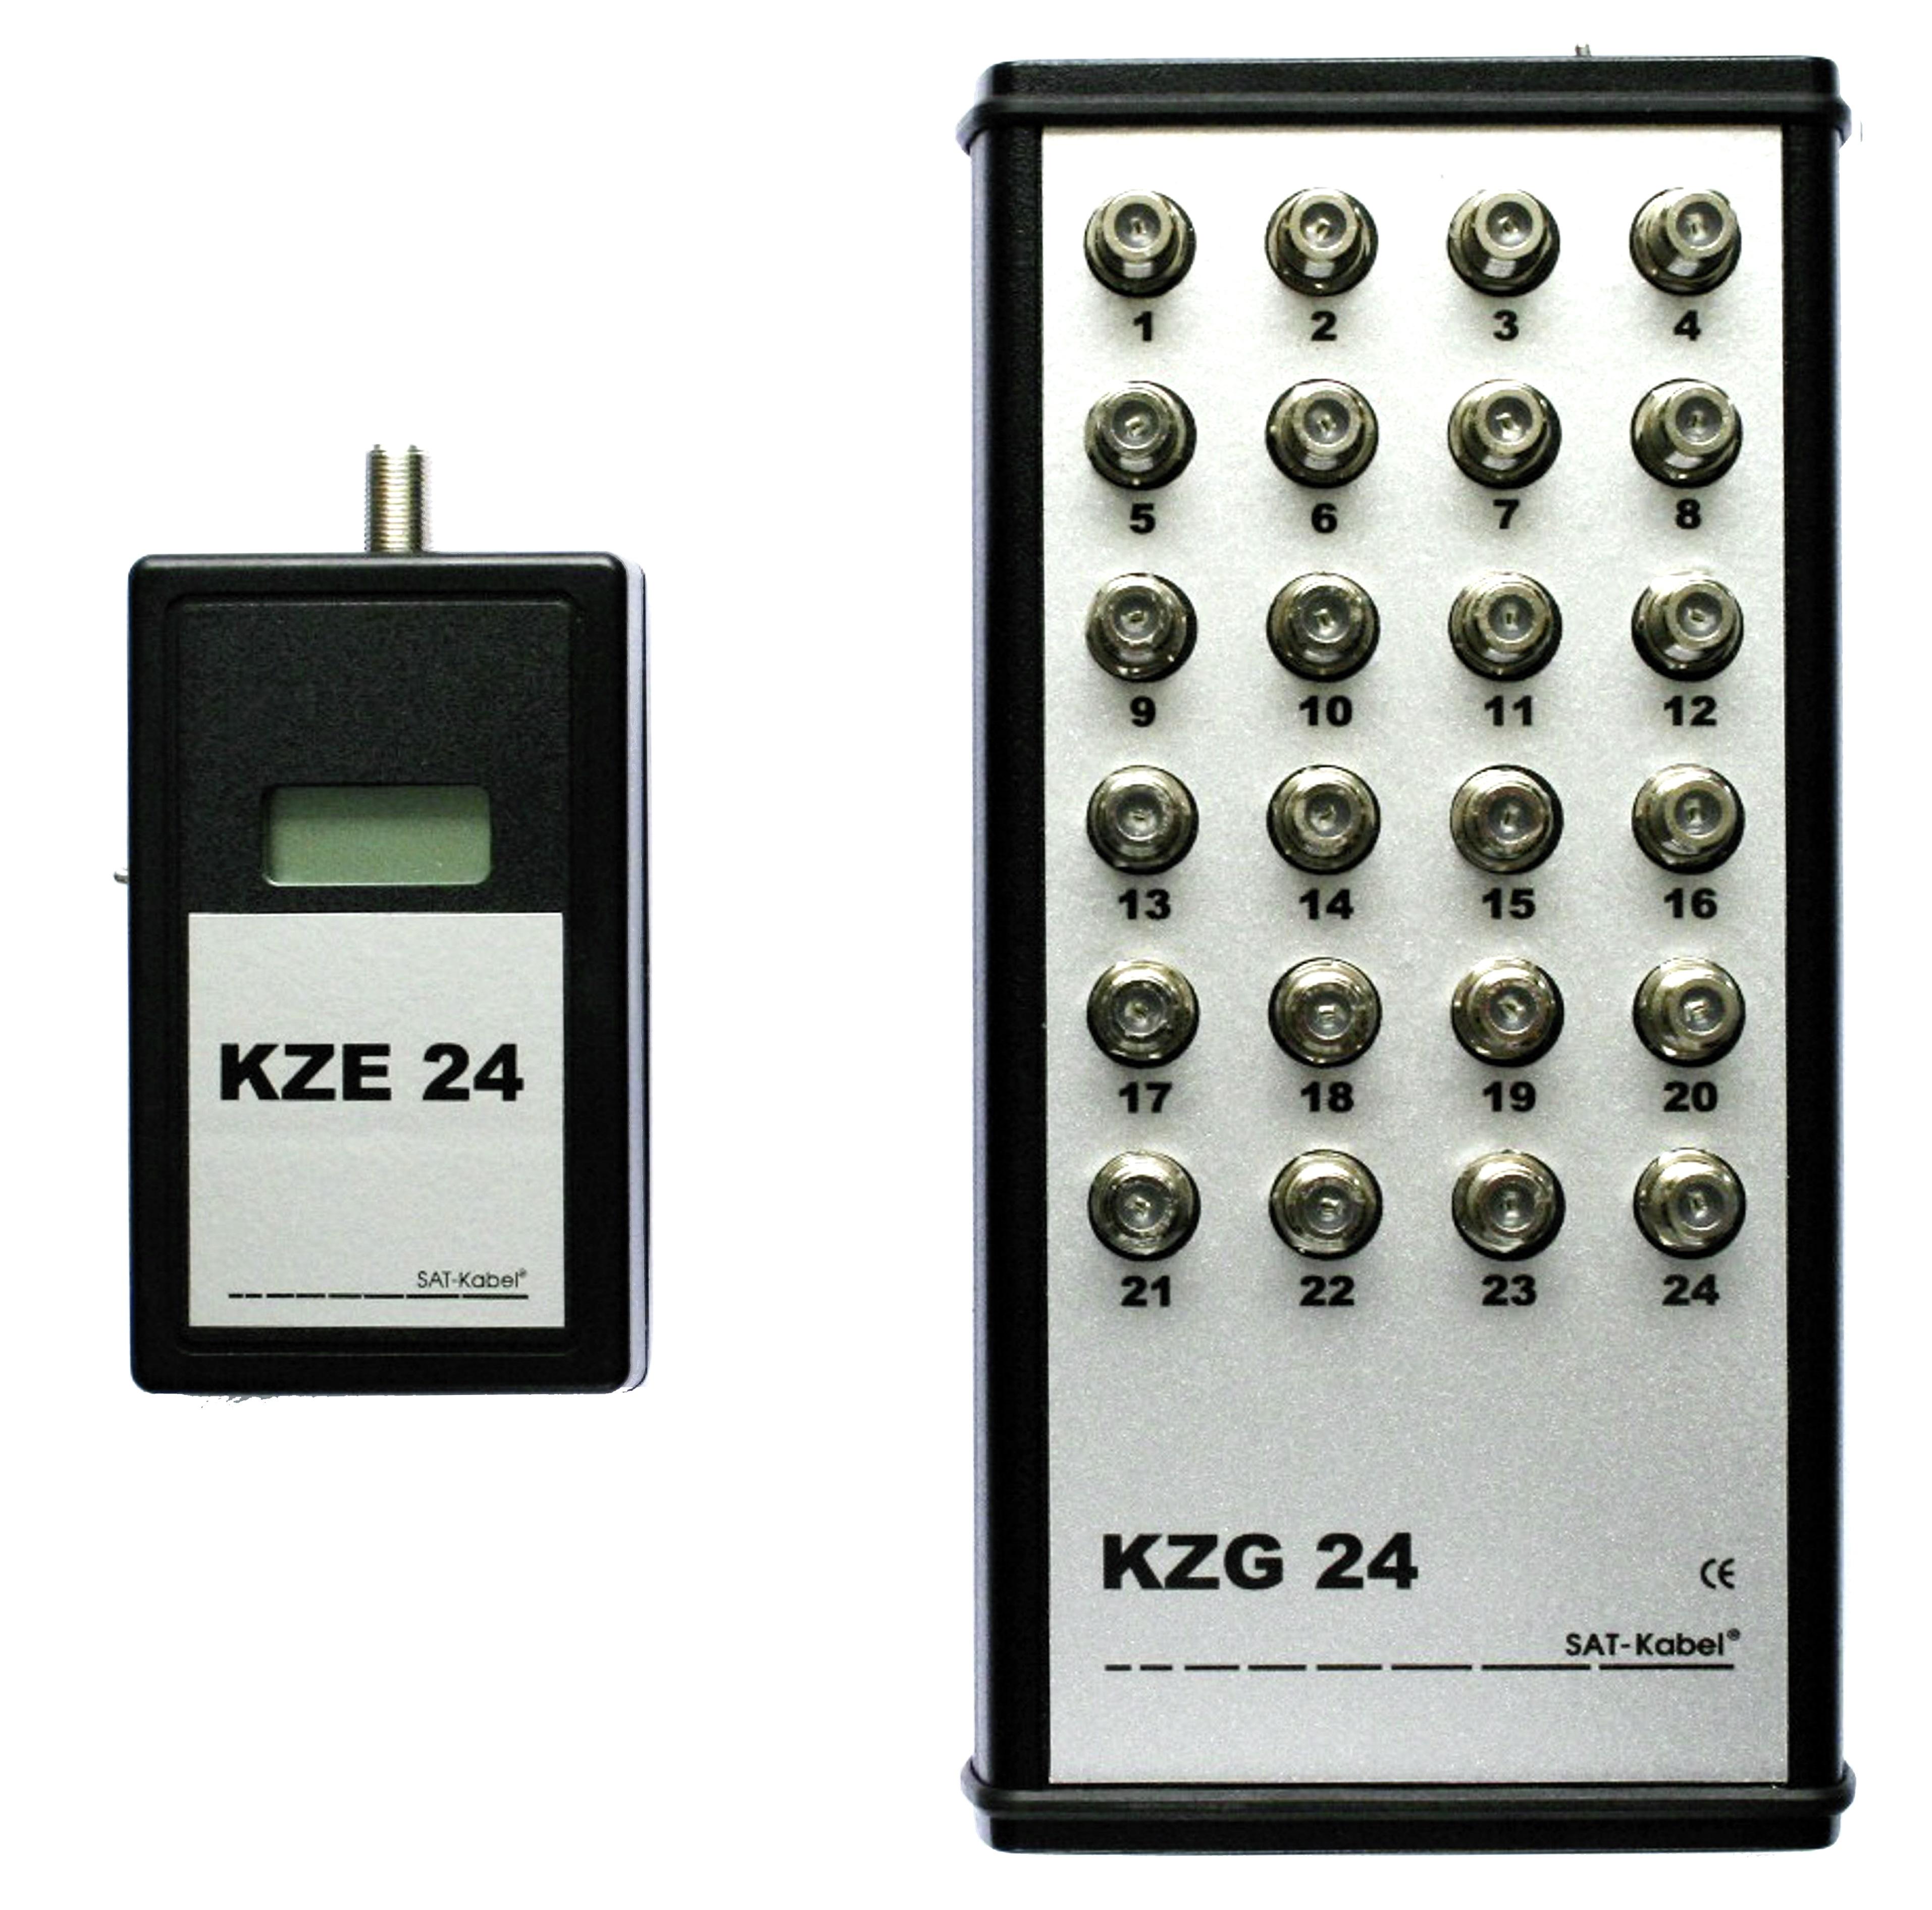 KZG 24 Set